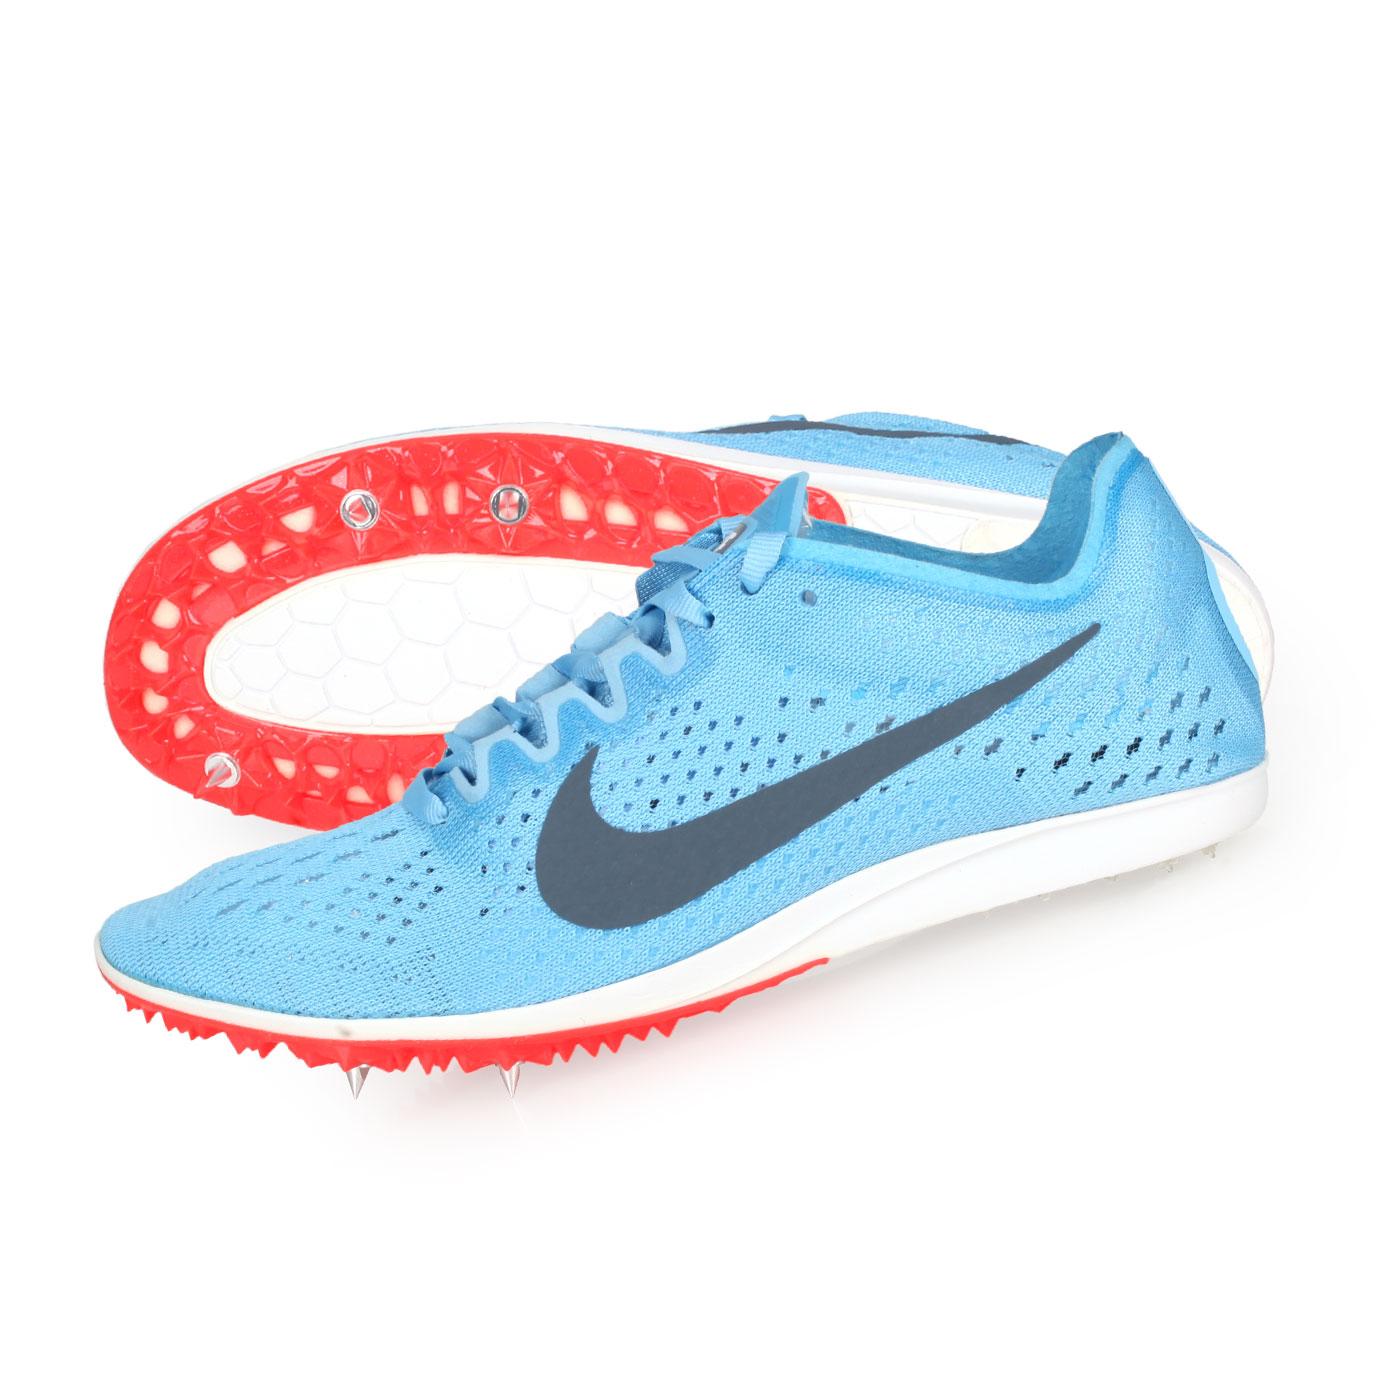 NIKE 田徑釘鞋(長距離)  @ZOOM MATUMBO 3@835995446 - 淺藍灰